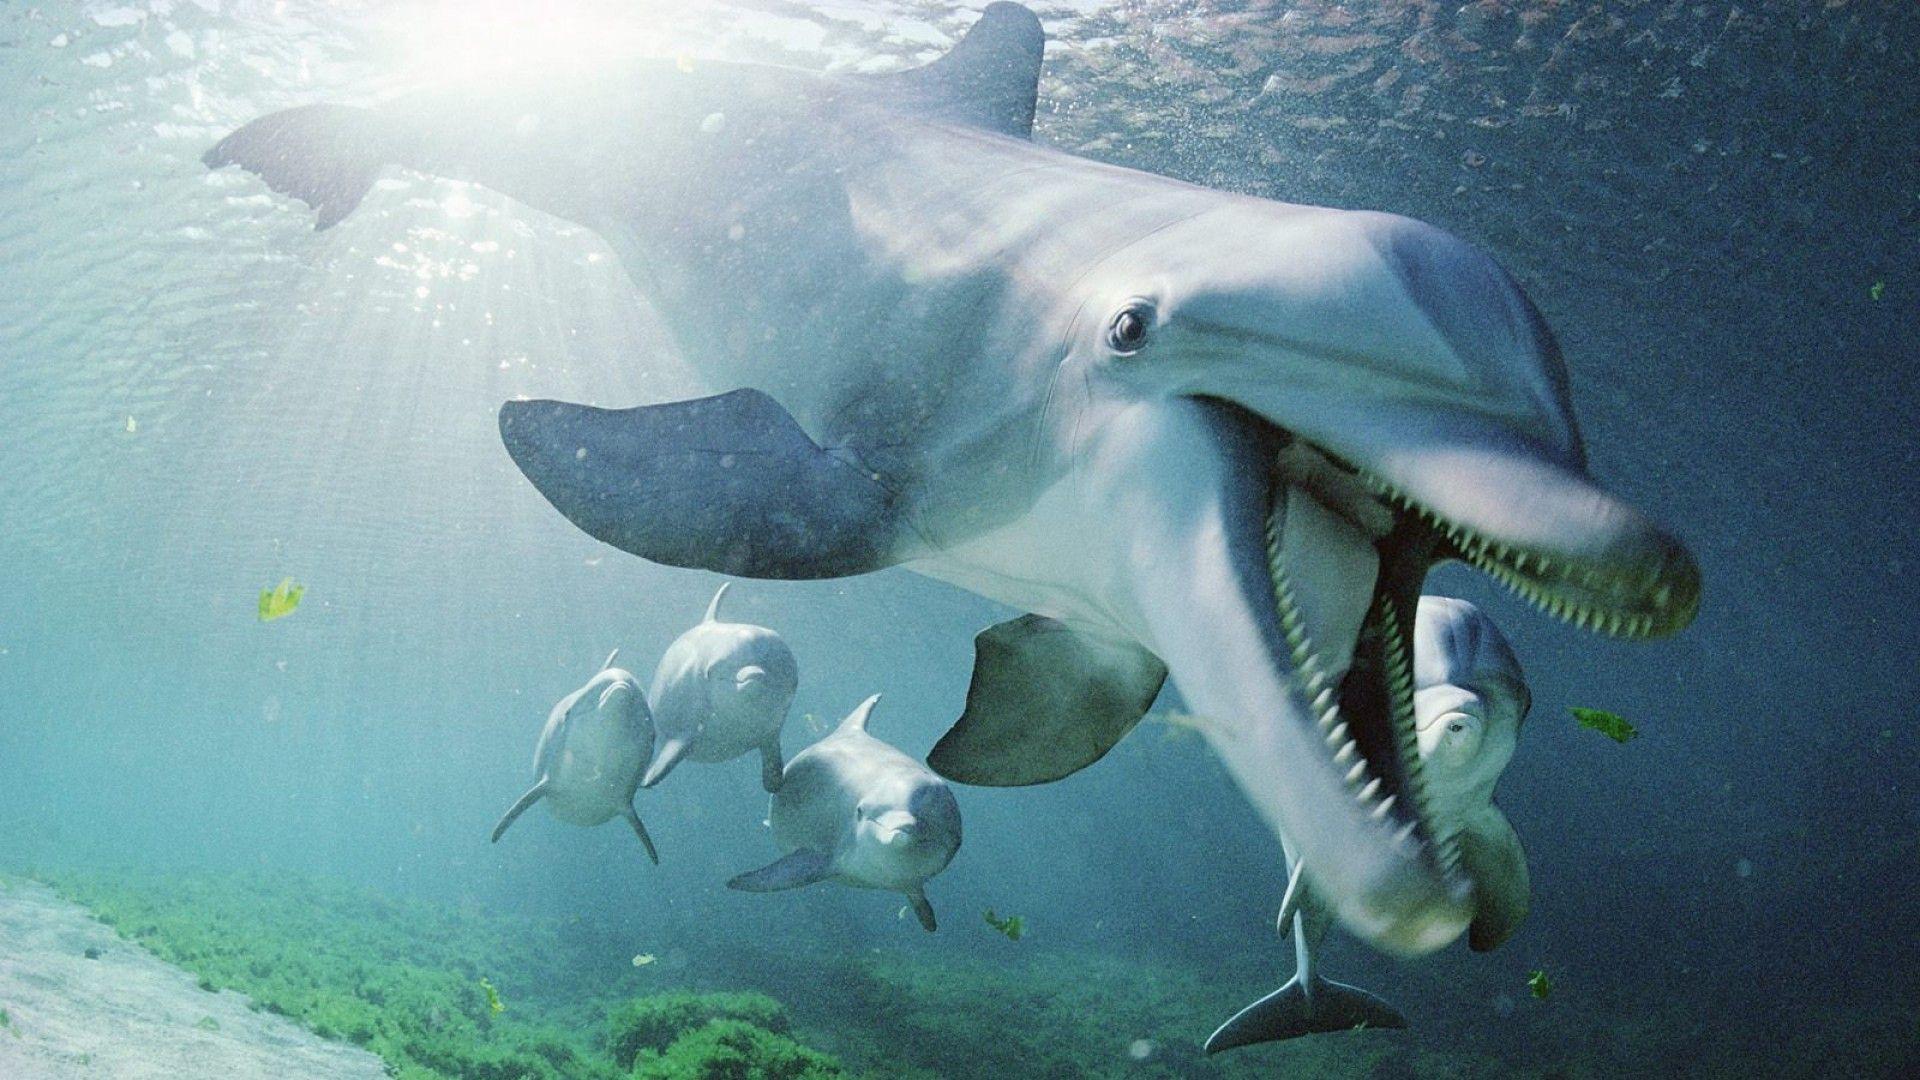 1920x1080 Wallpaper dolphin, underwater, swimming, sea